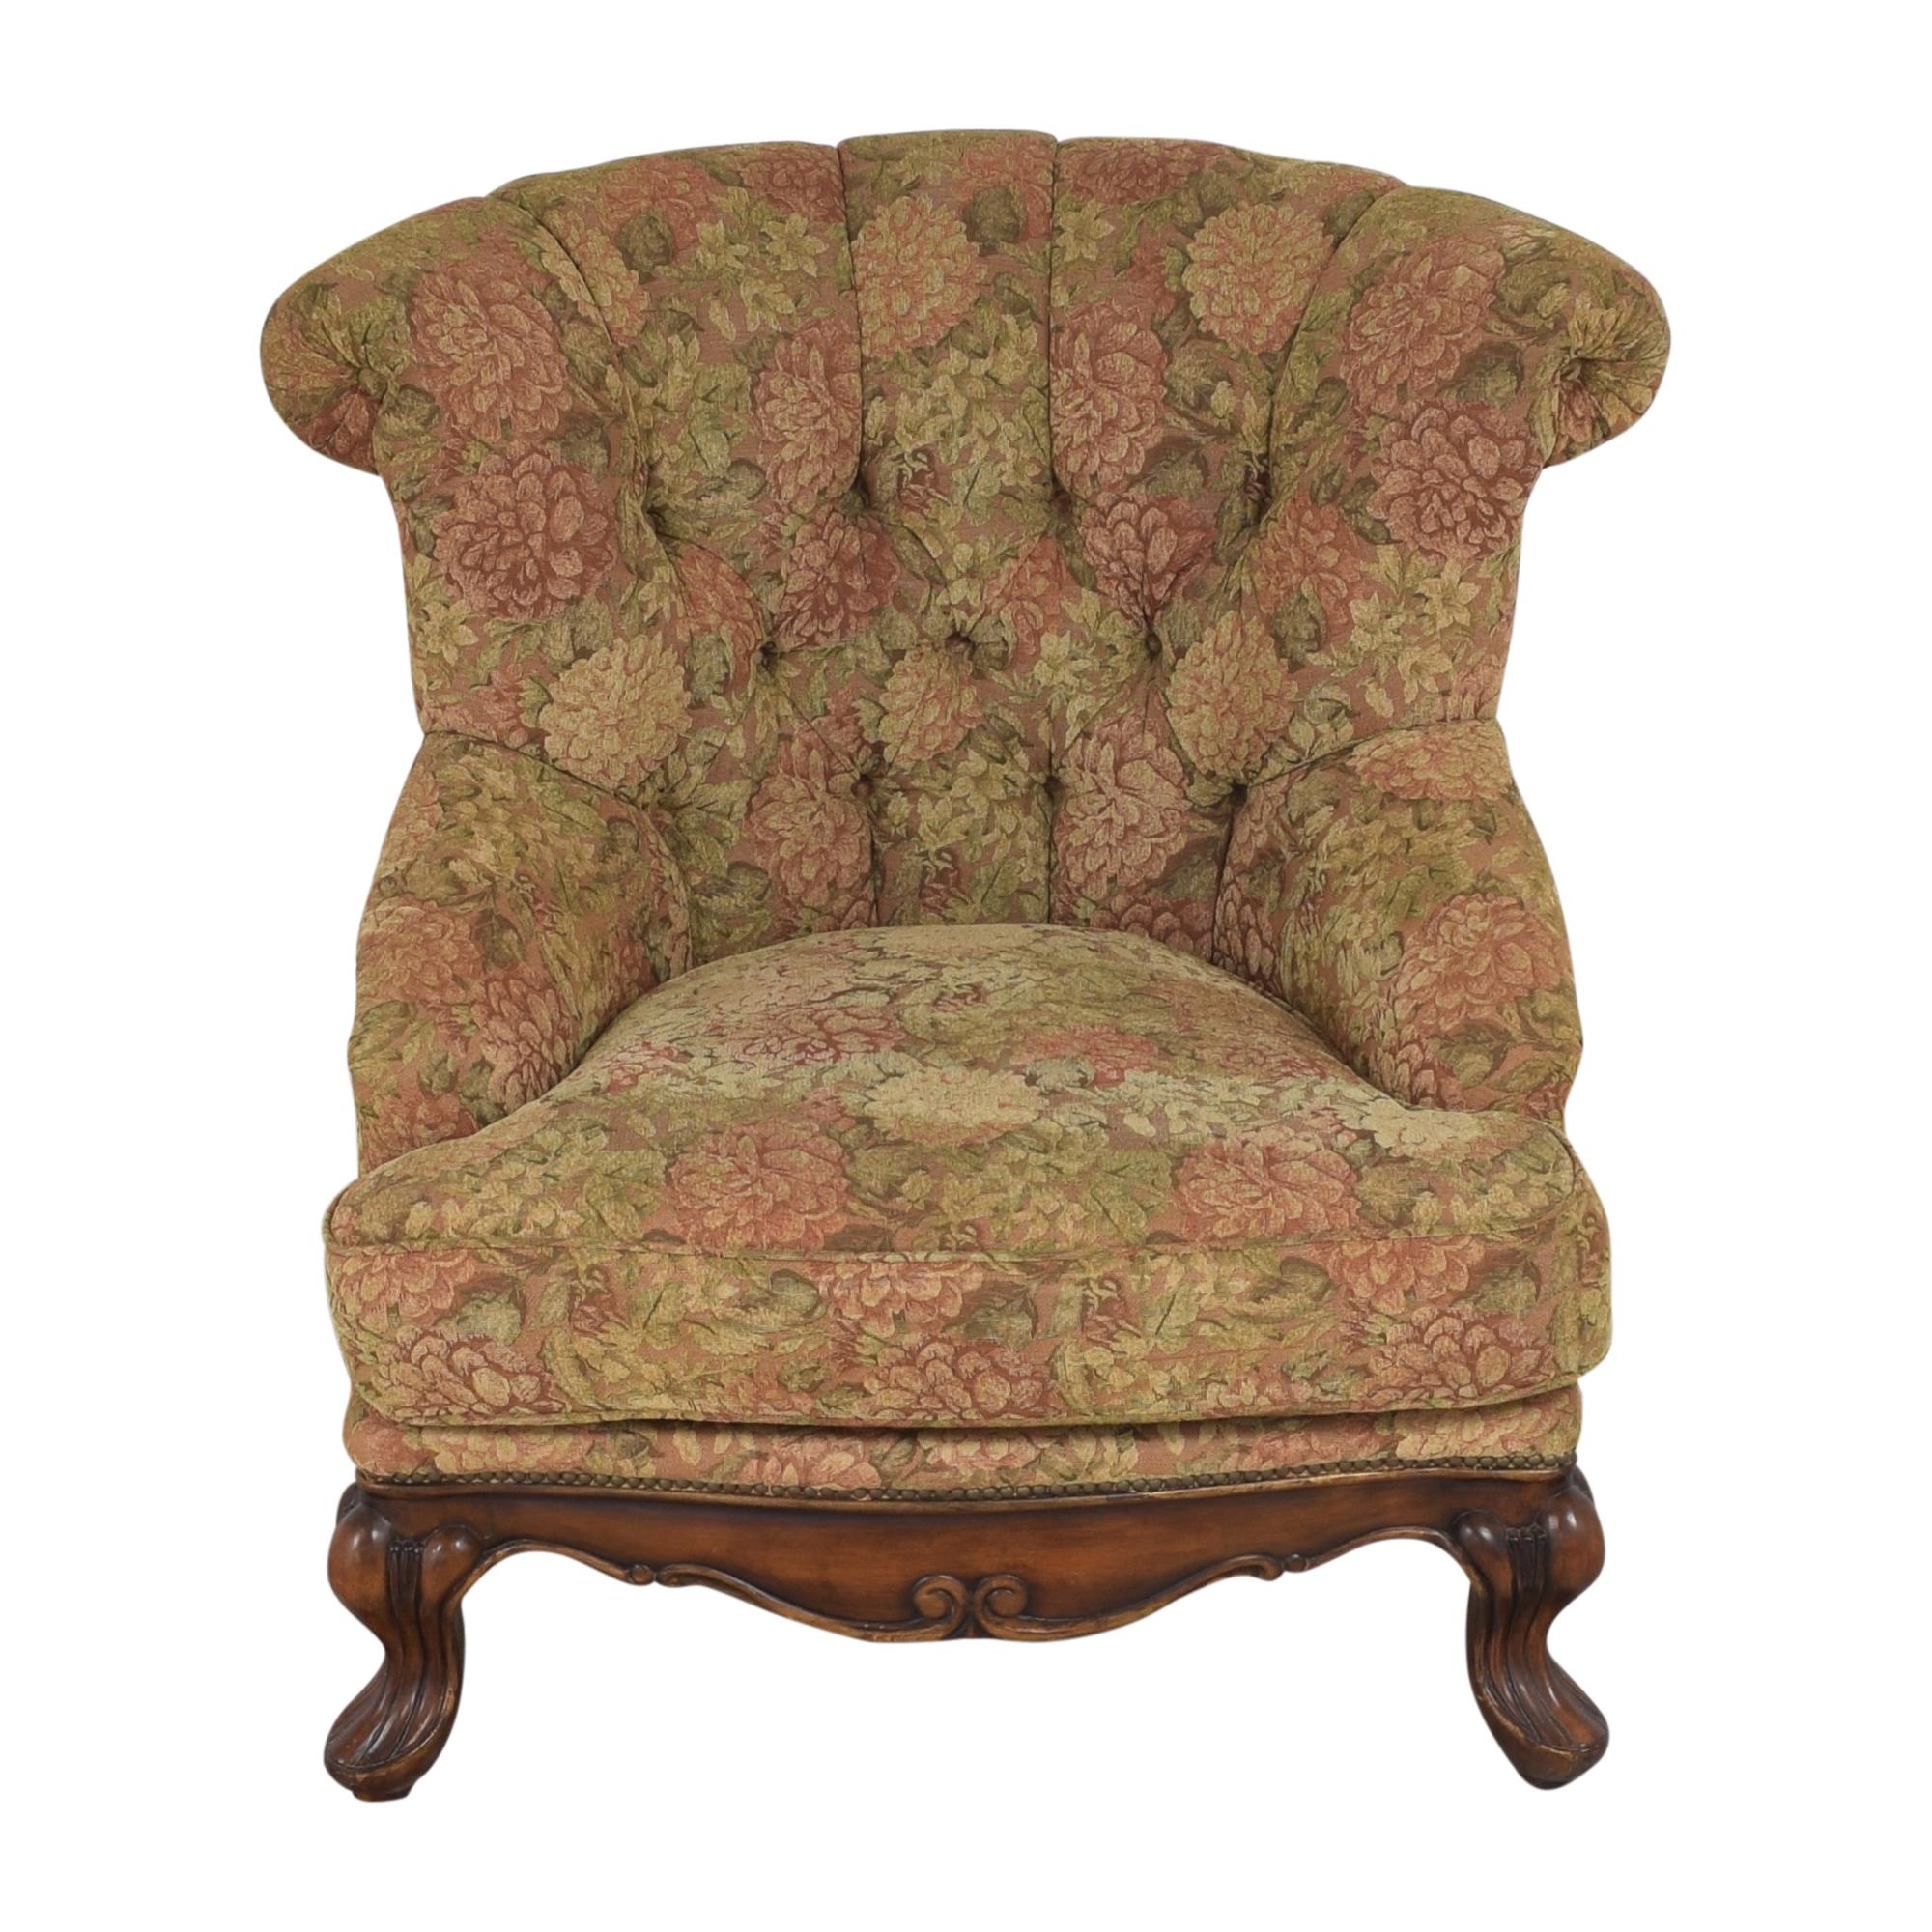 Schnadig Schnadig Compositions Bazille Chair